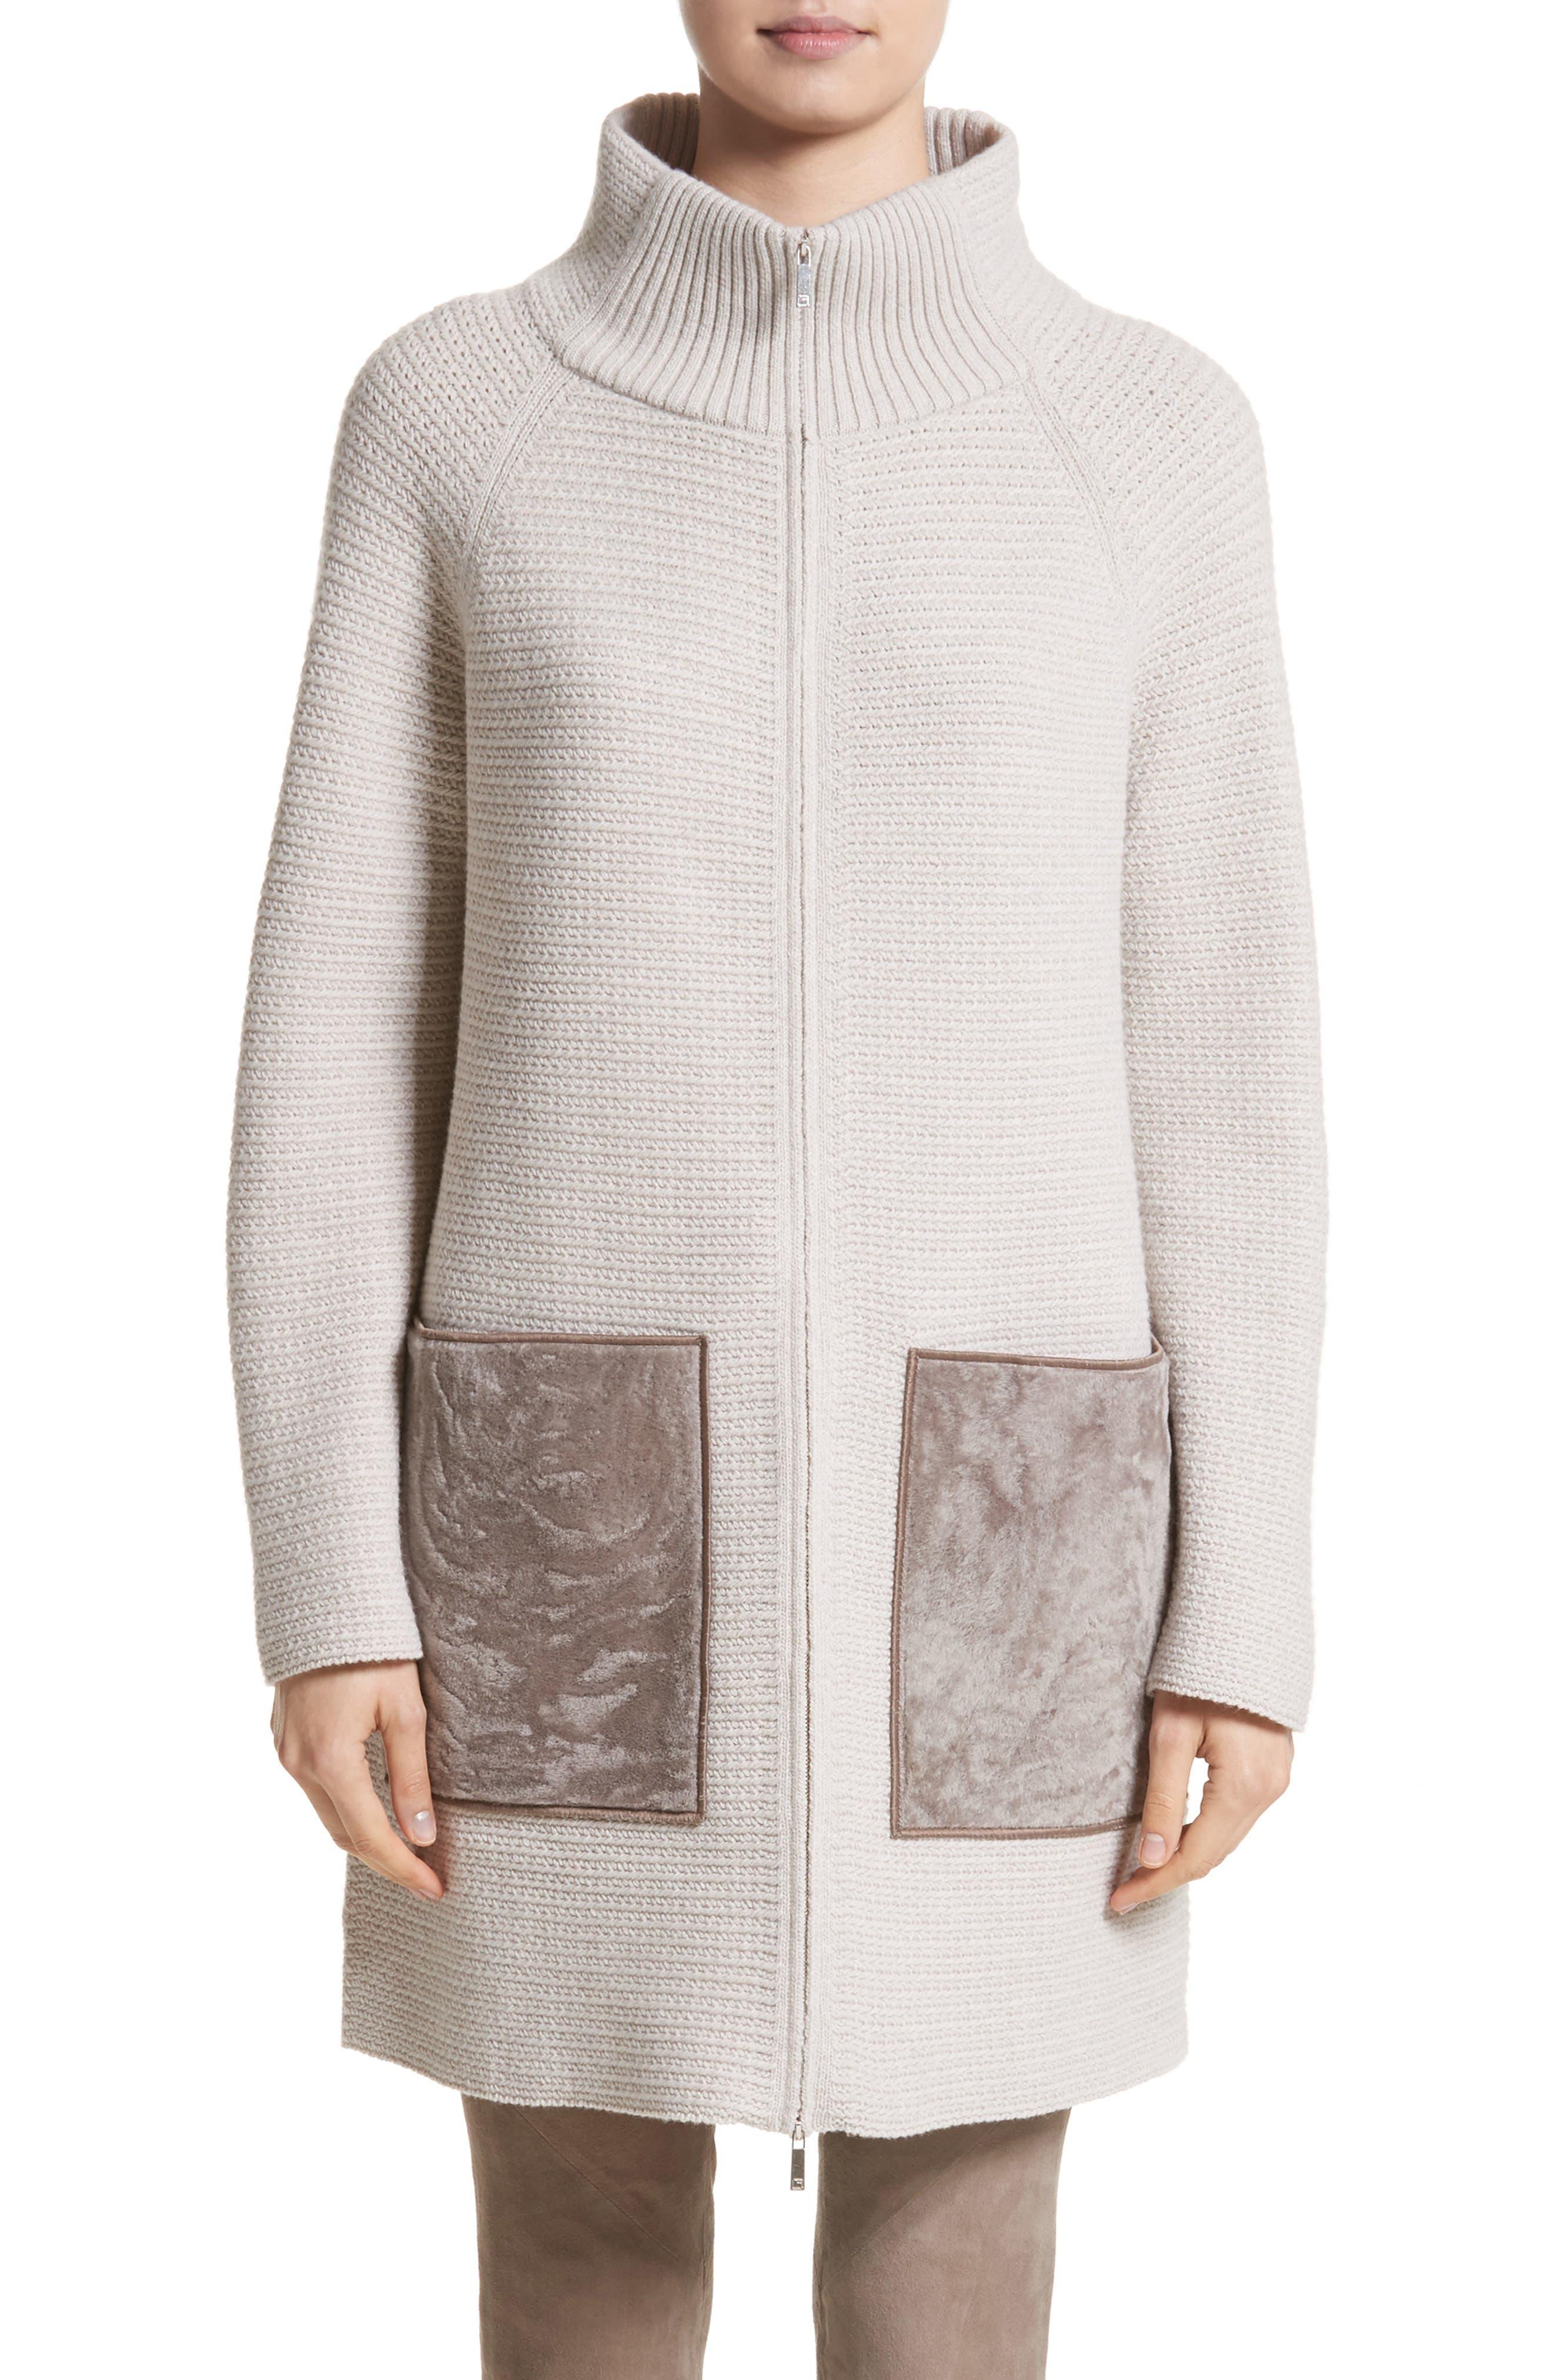 Alternate Image 1 Selected - Lafayette 148 New York Wool & Cashmere Herringbone Stitch Cardigan with Genuine Shearling Pockets